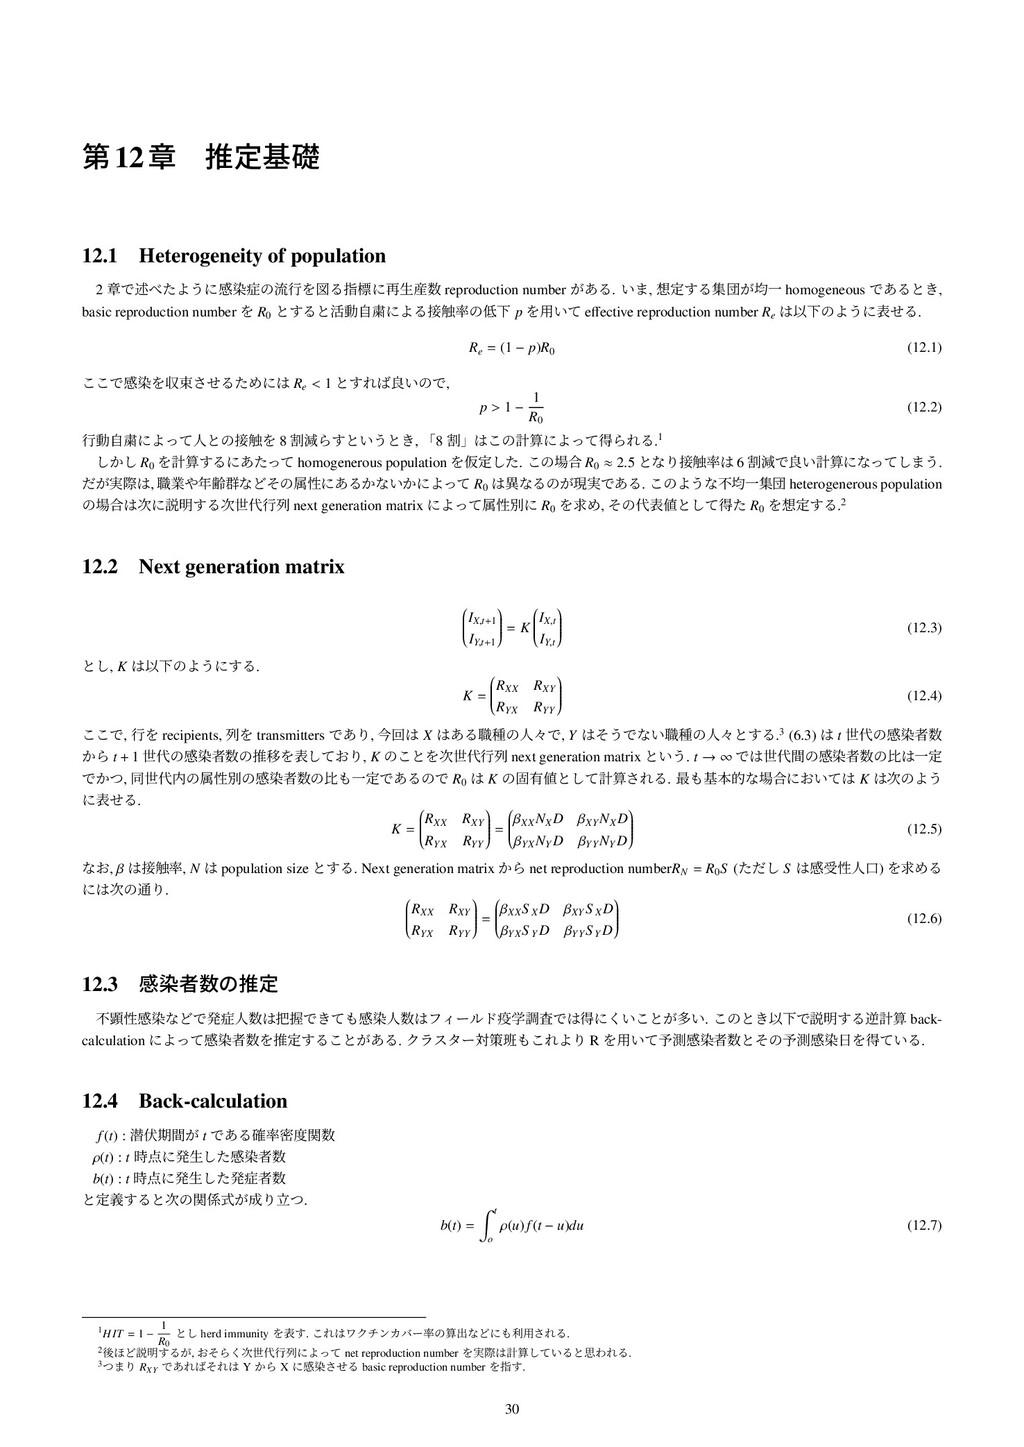 ୈ12ষ ਪఆجૅ 12.1 Heterogeneity of population 2 ষͰ...